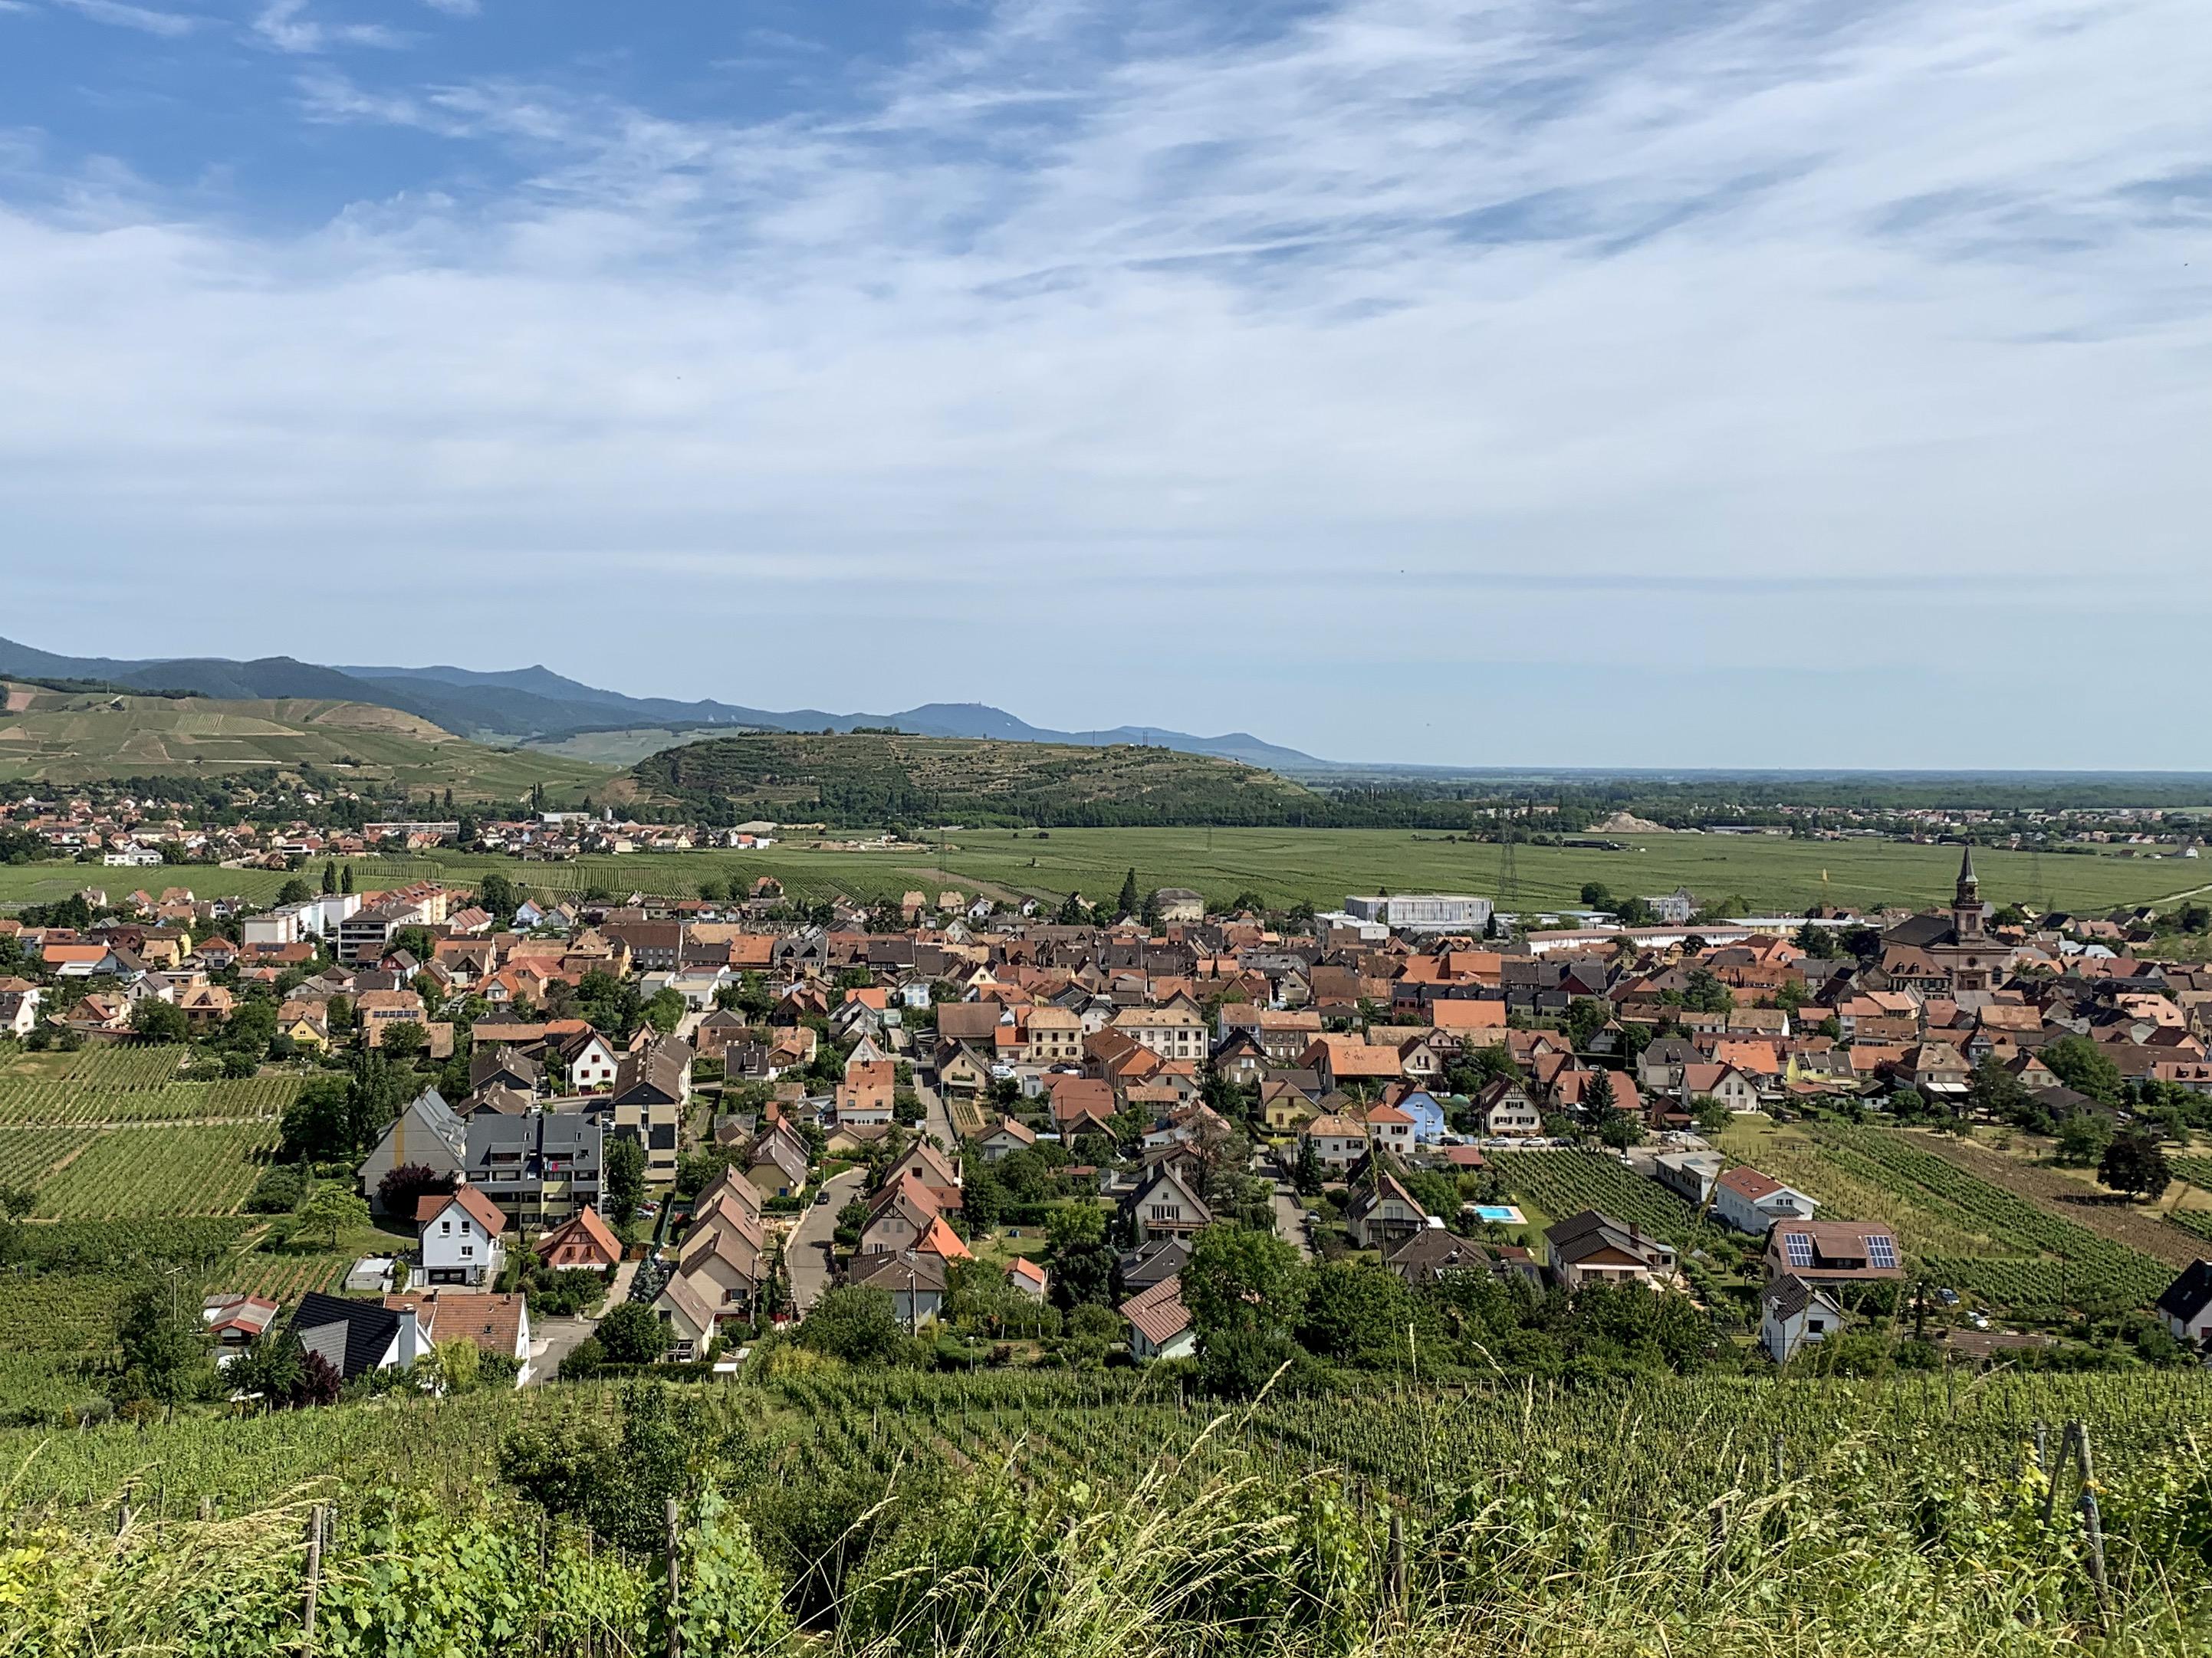 Pogled na Wintzenheim